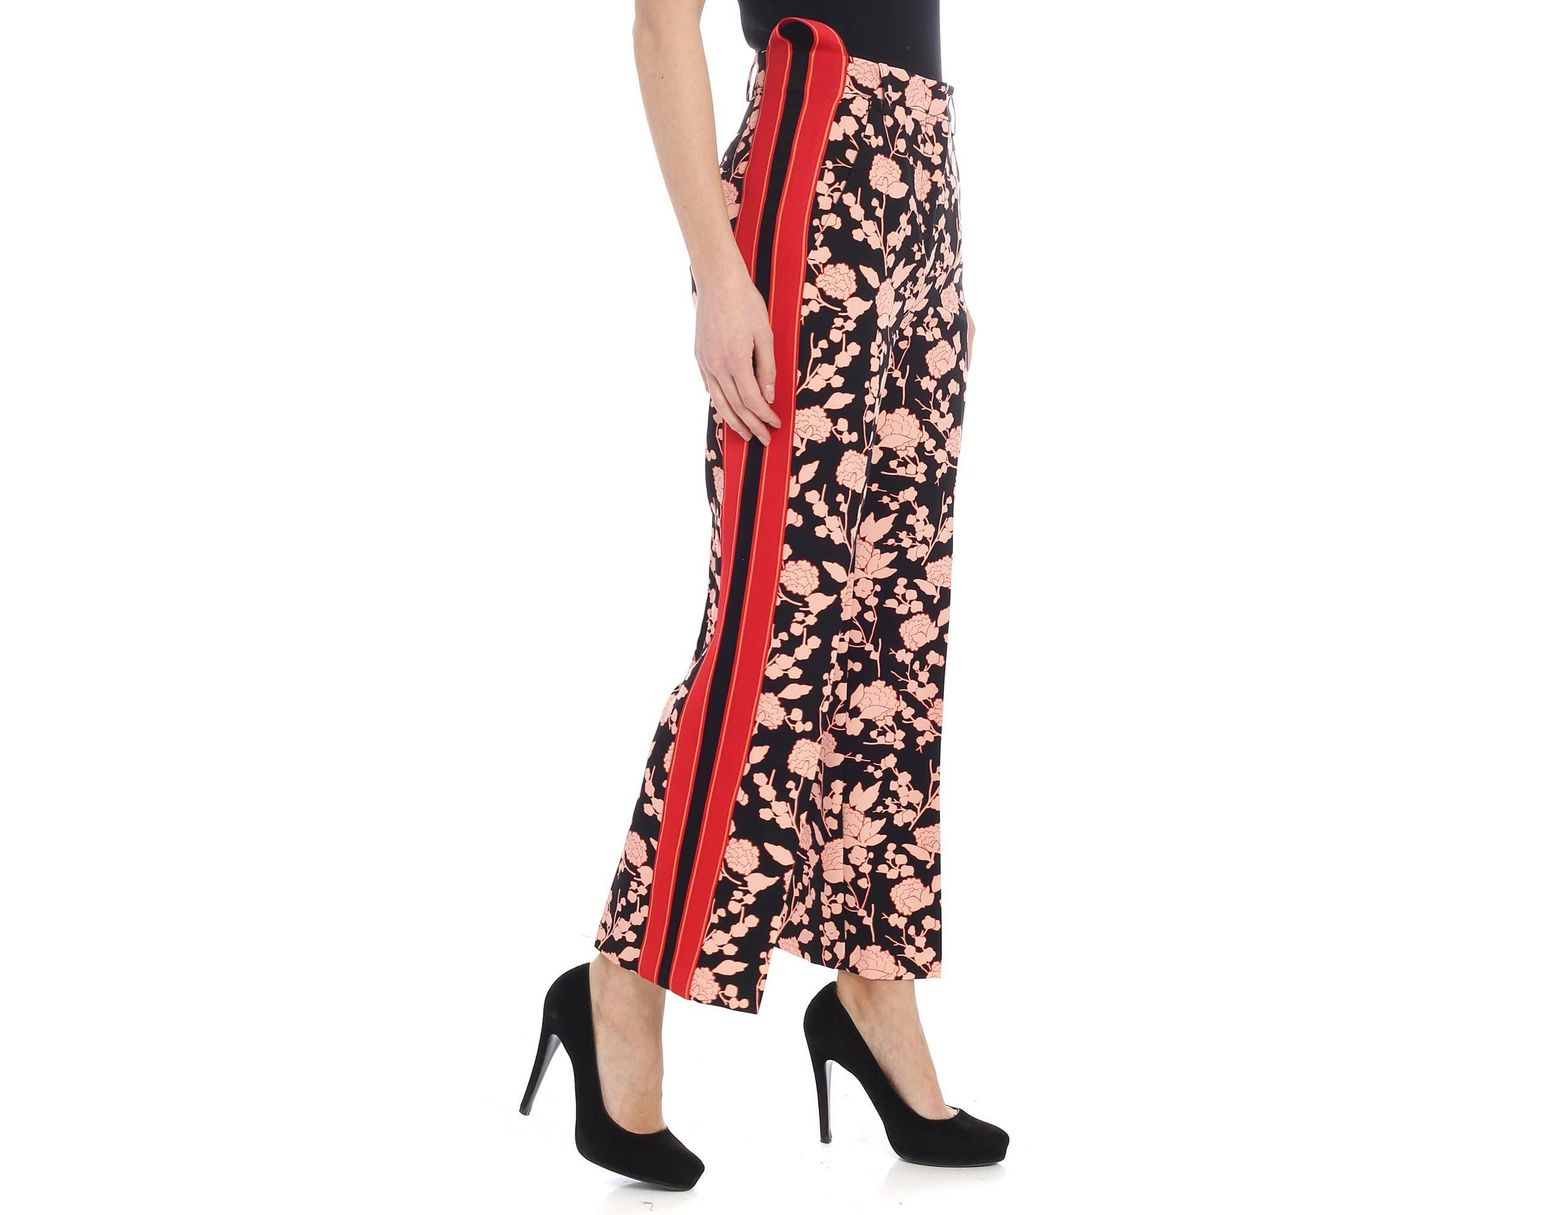 d0b6963e71 Women's Red Pants In Raspberry Printed Black Cady